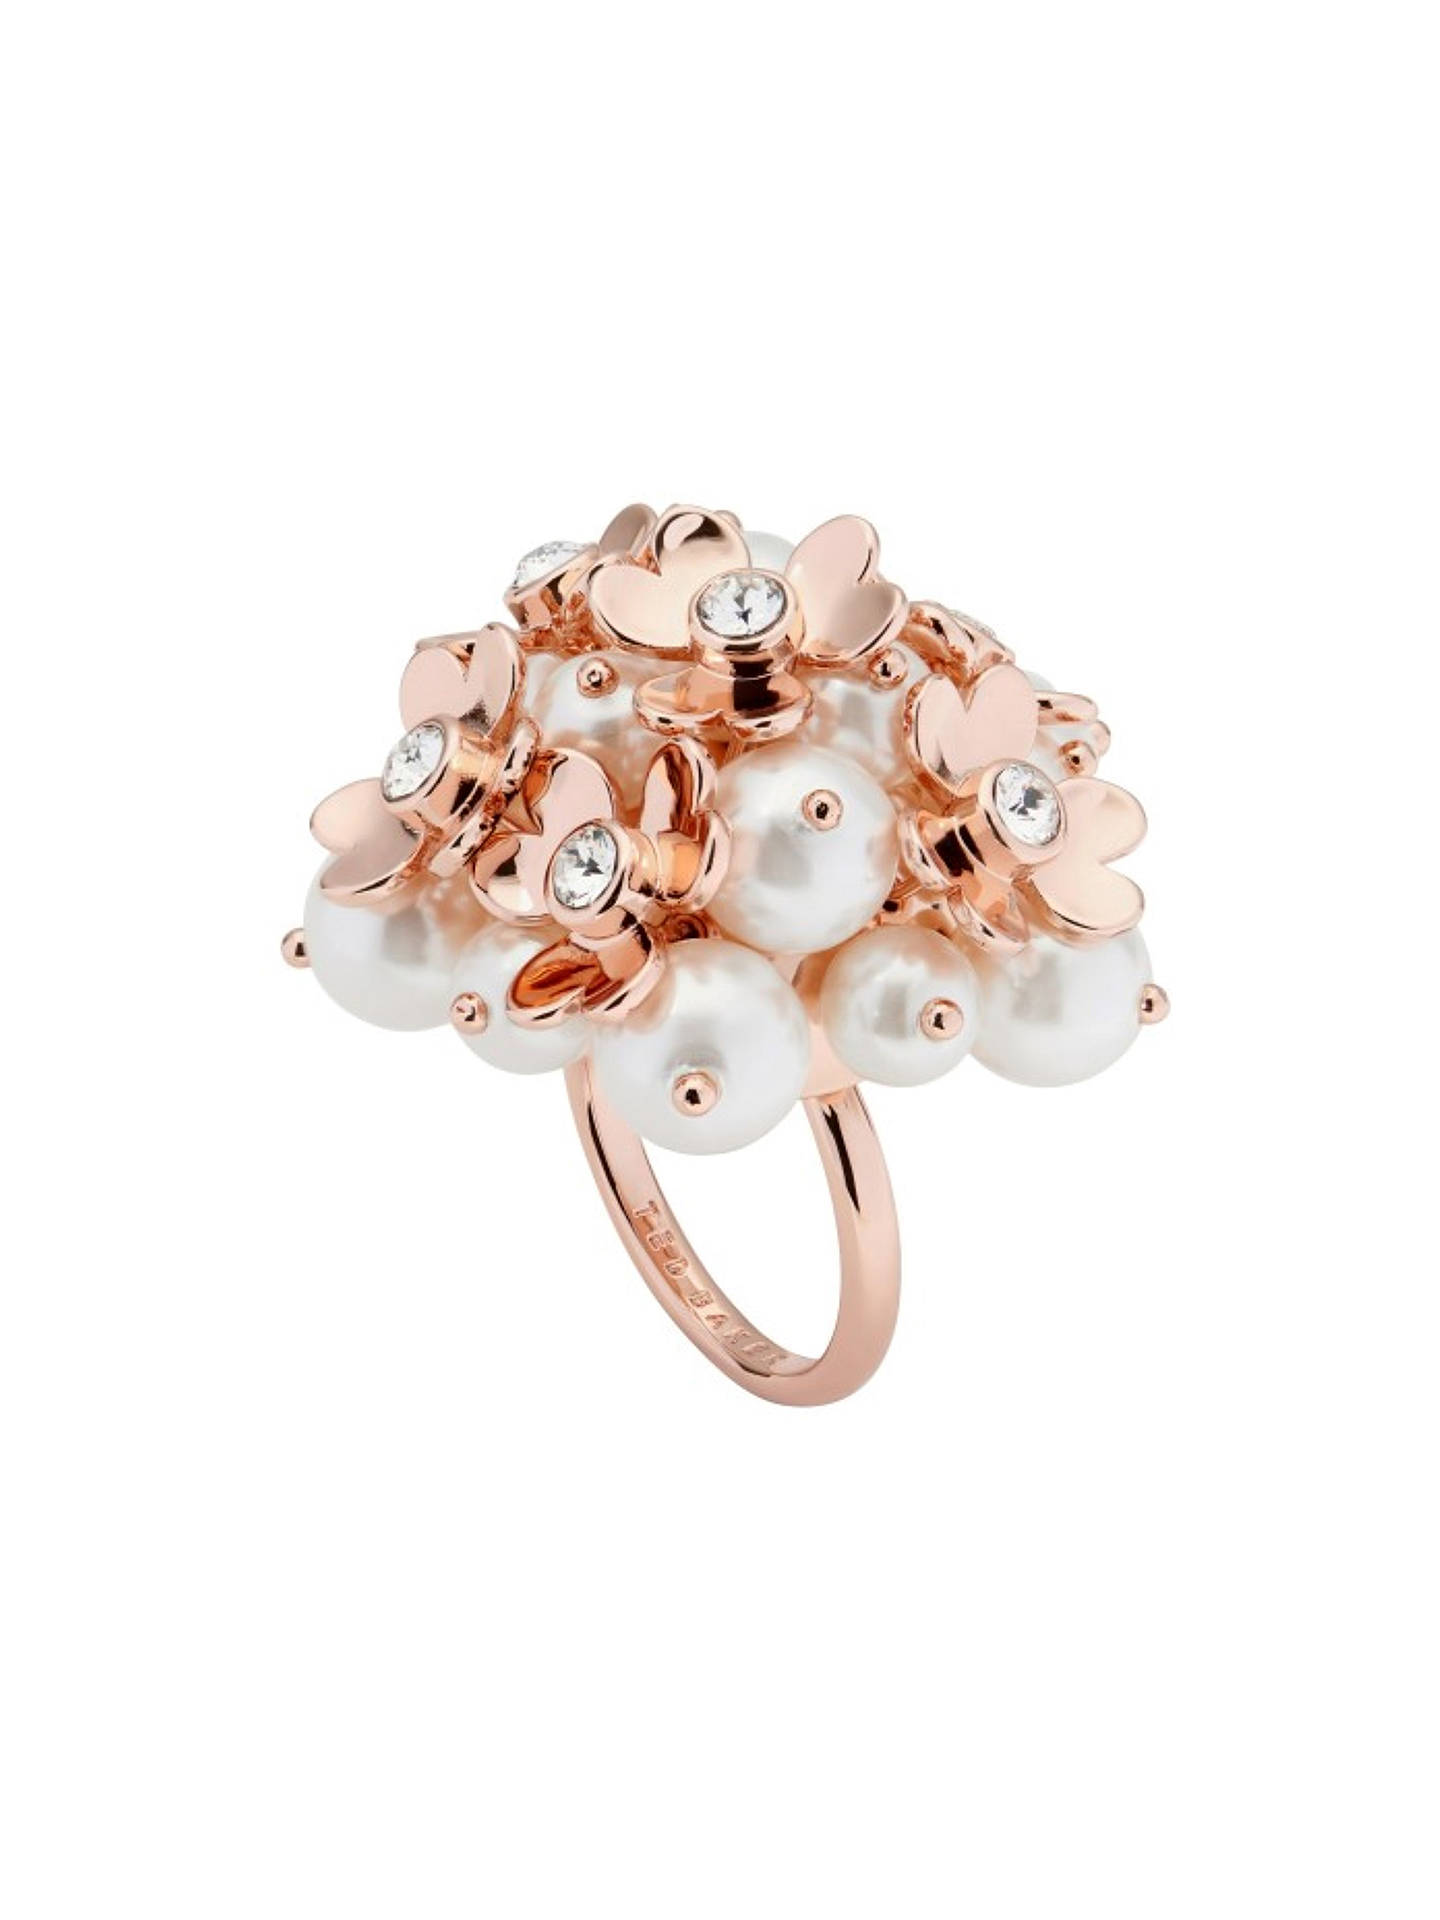 Ted Baker Blossom Ring At John Lewis Amp Partners